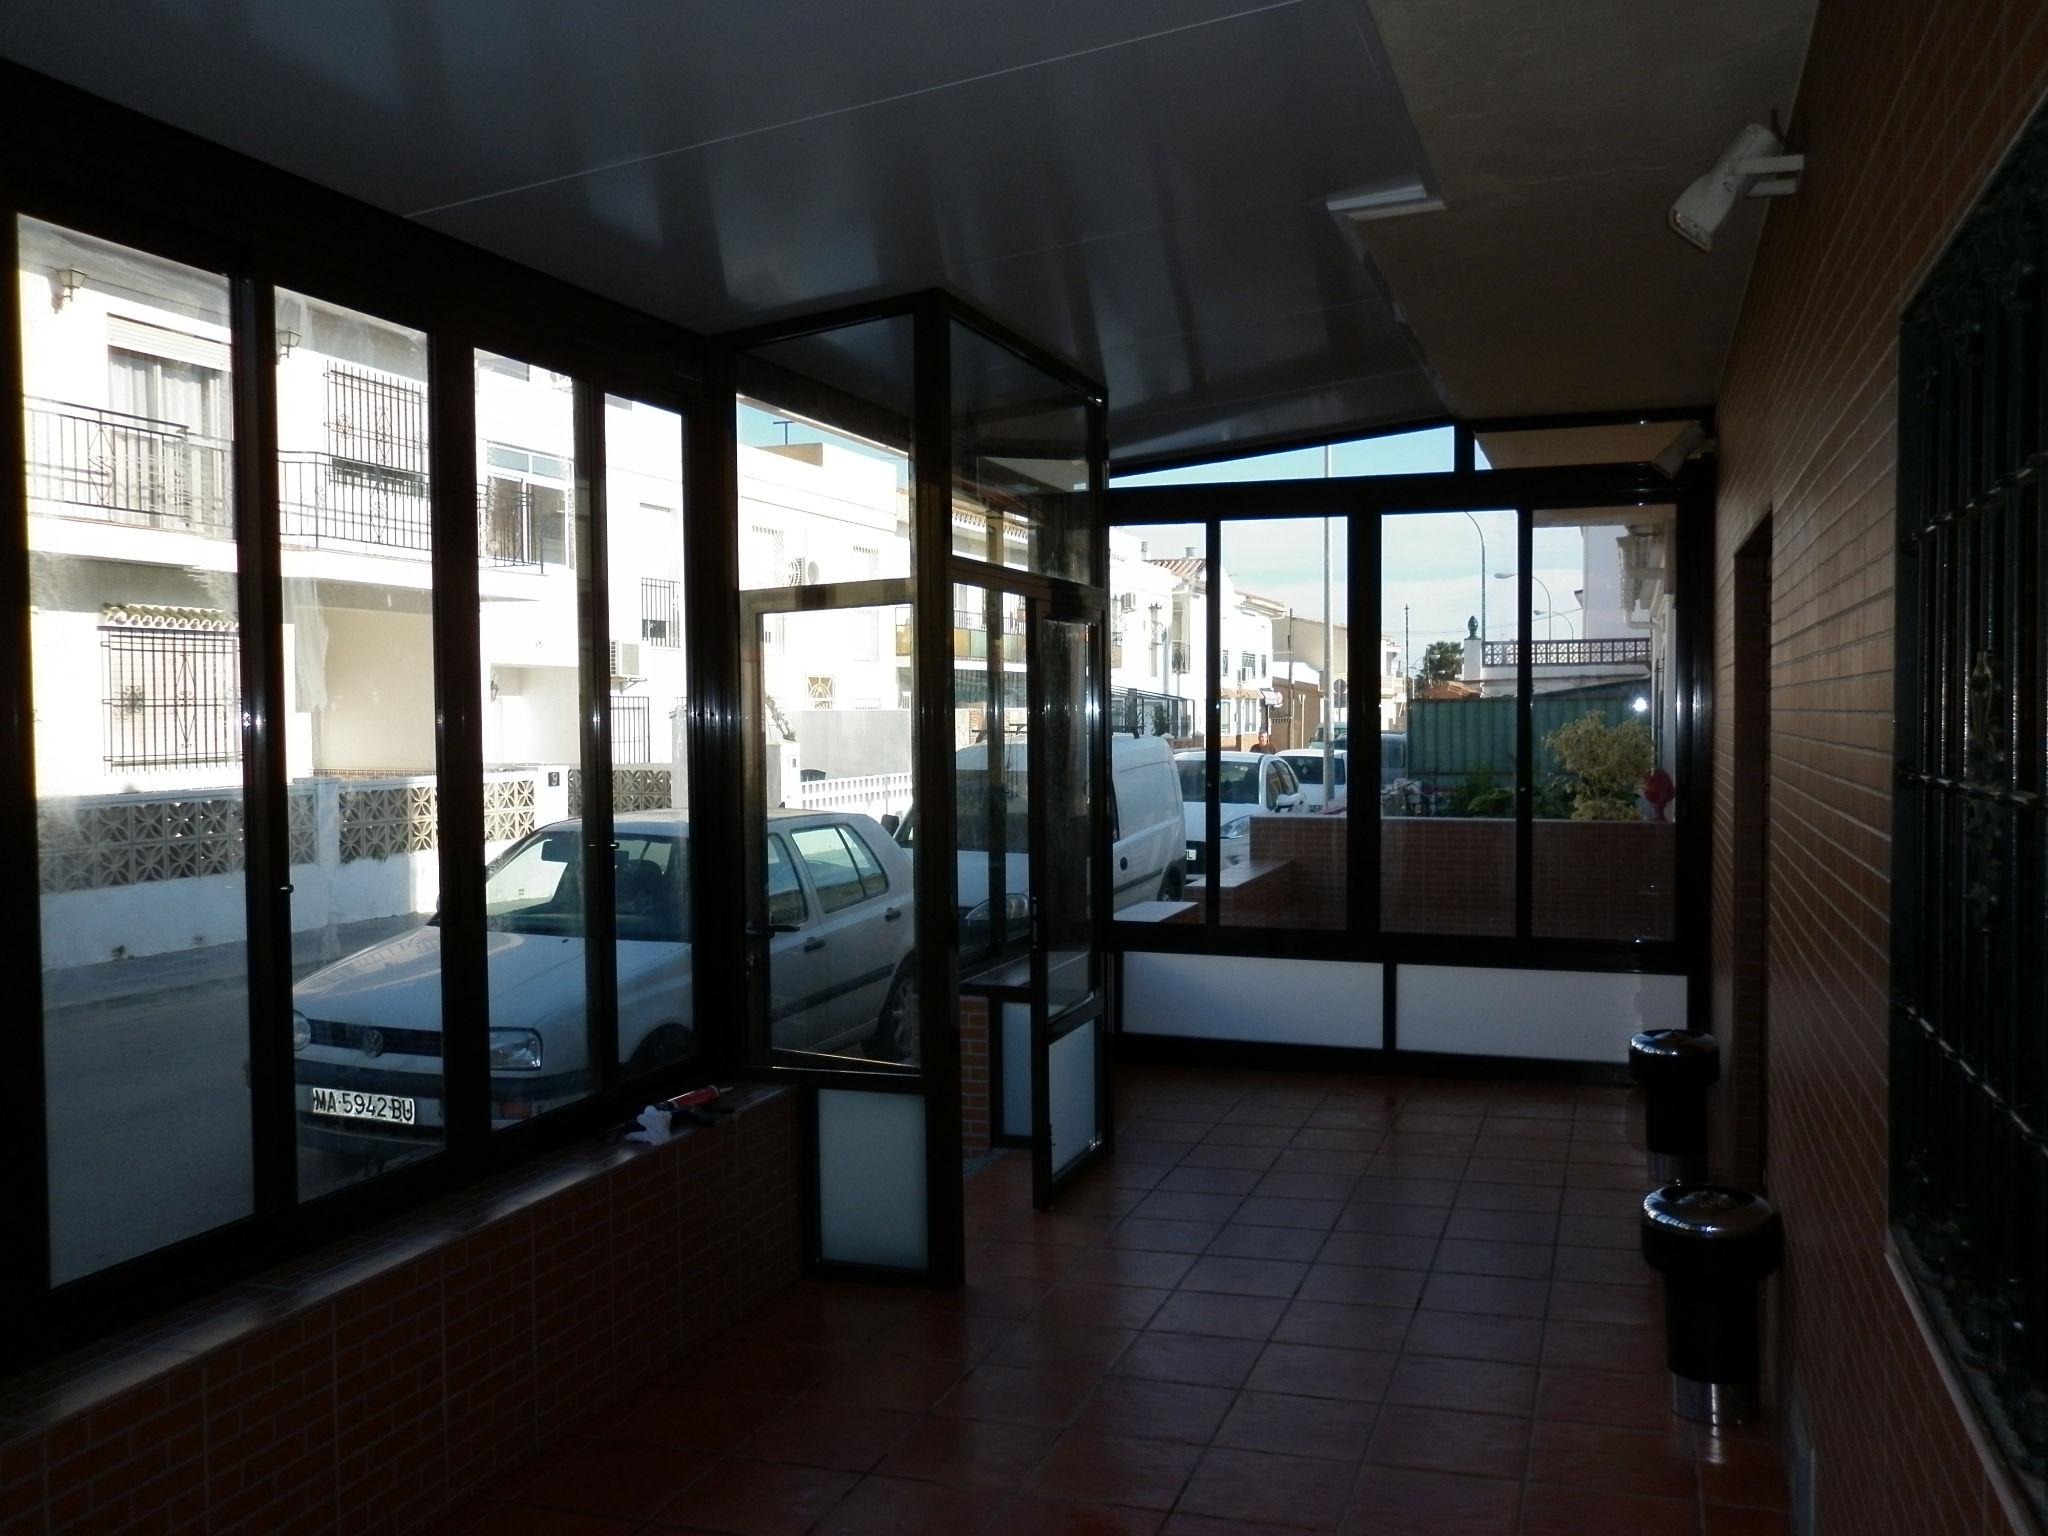 Foto 29 de Carpintería de aluminio, metálica y PVC en Málaga | Aluminios Alunoe